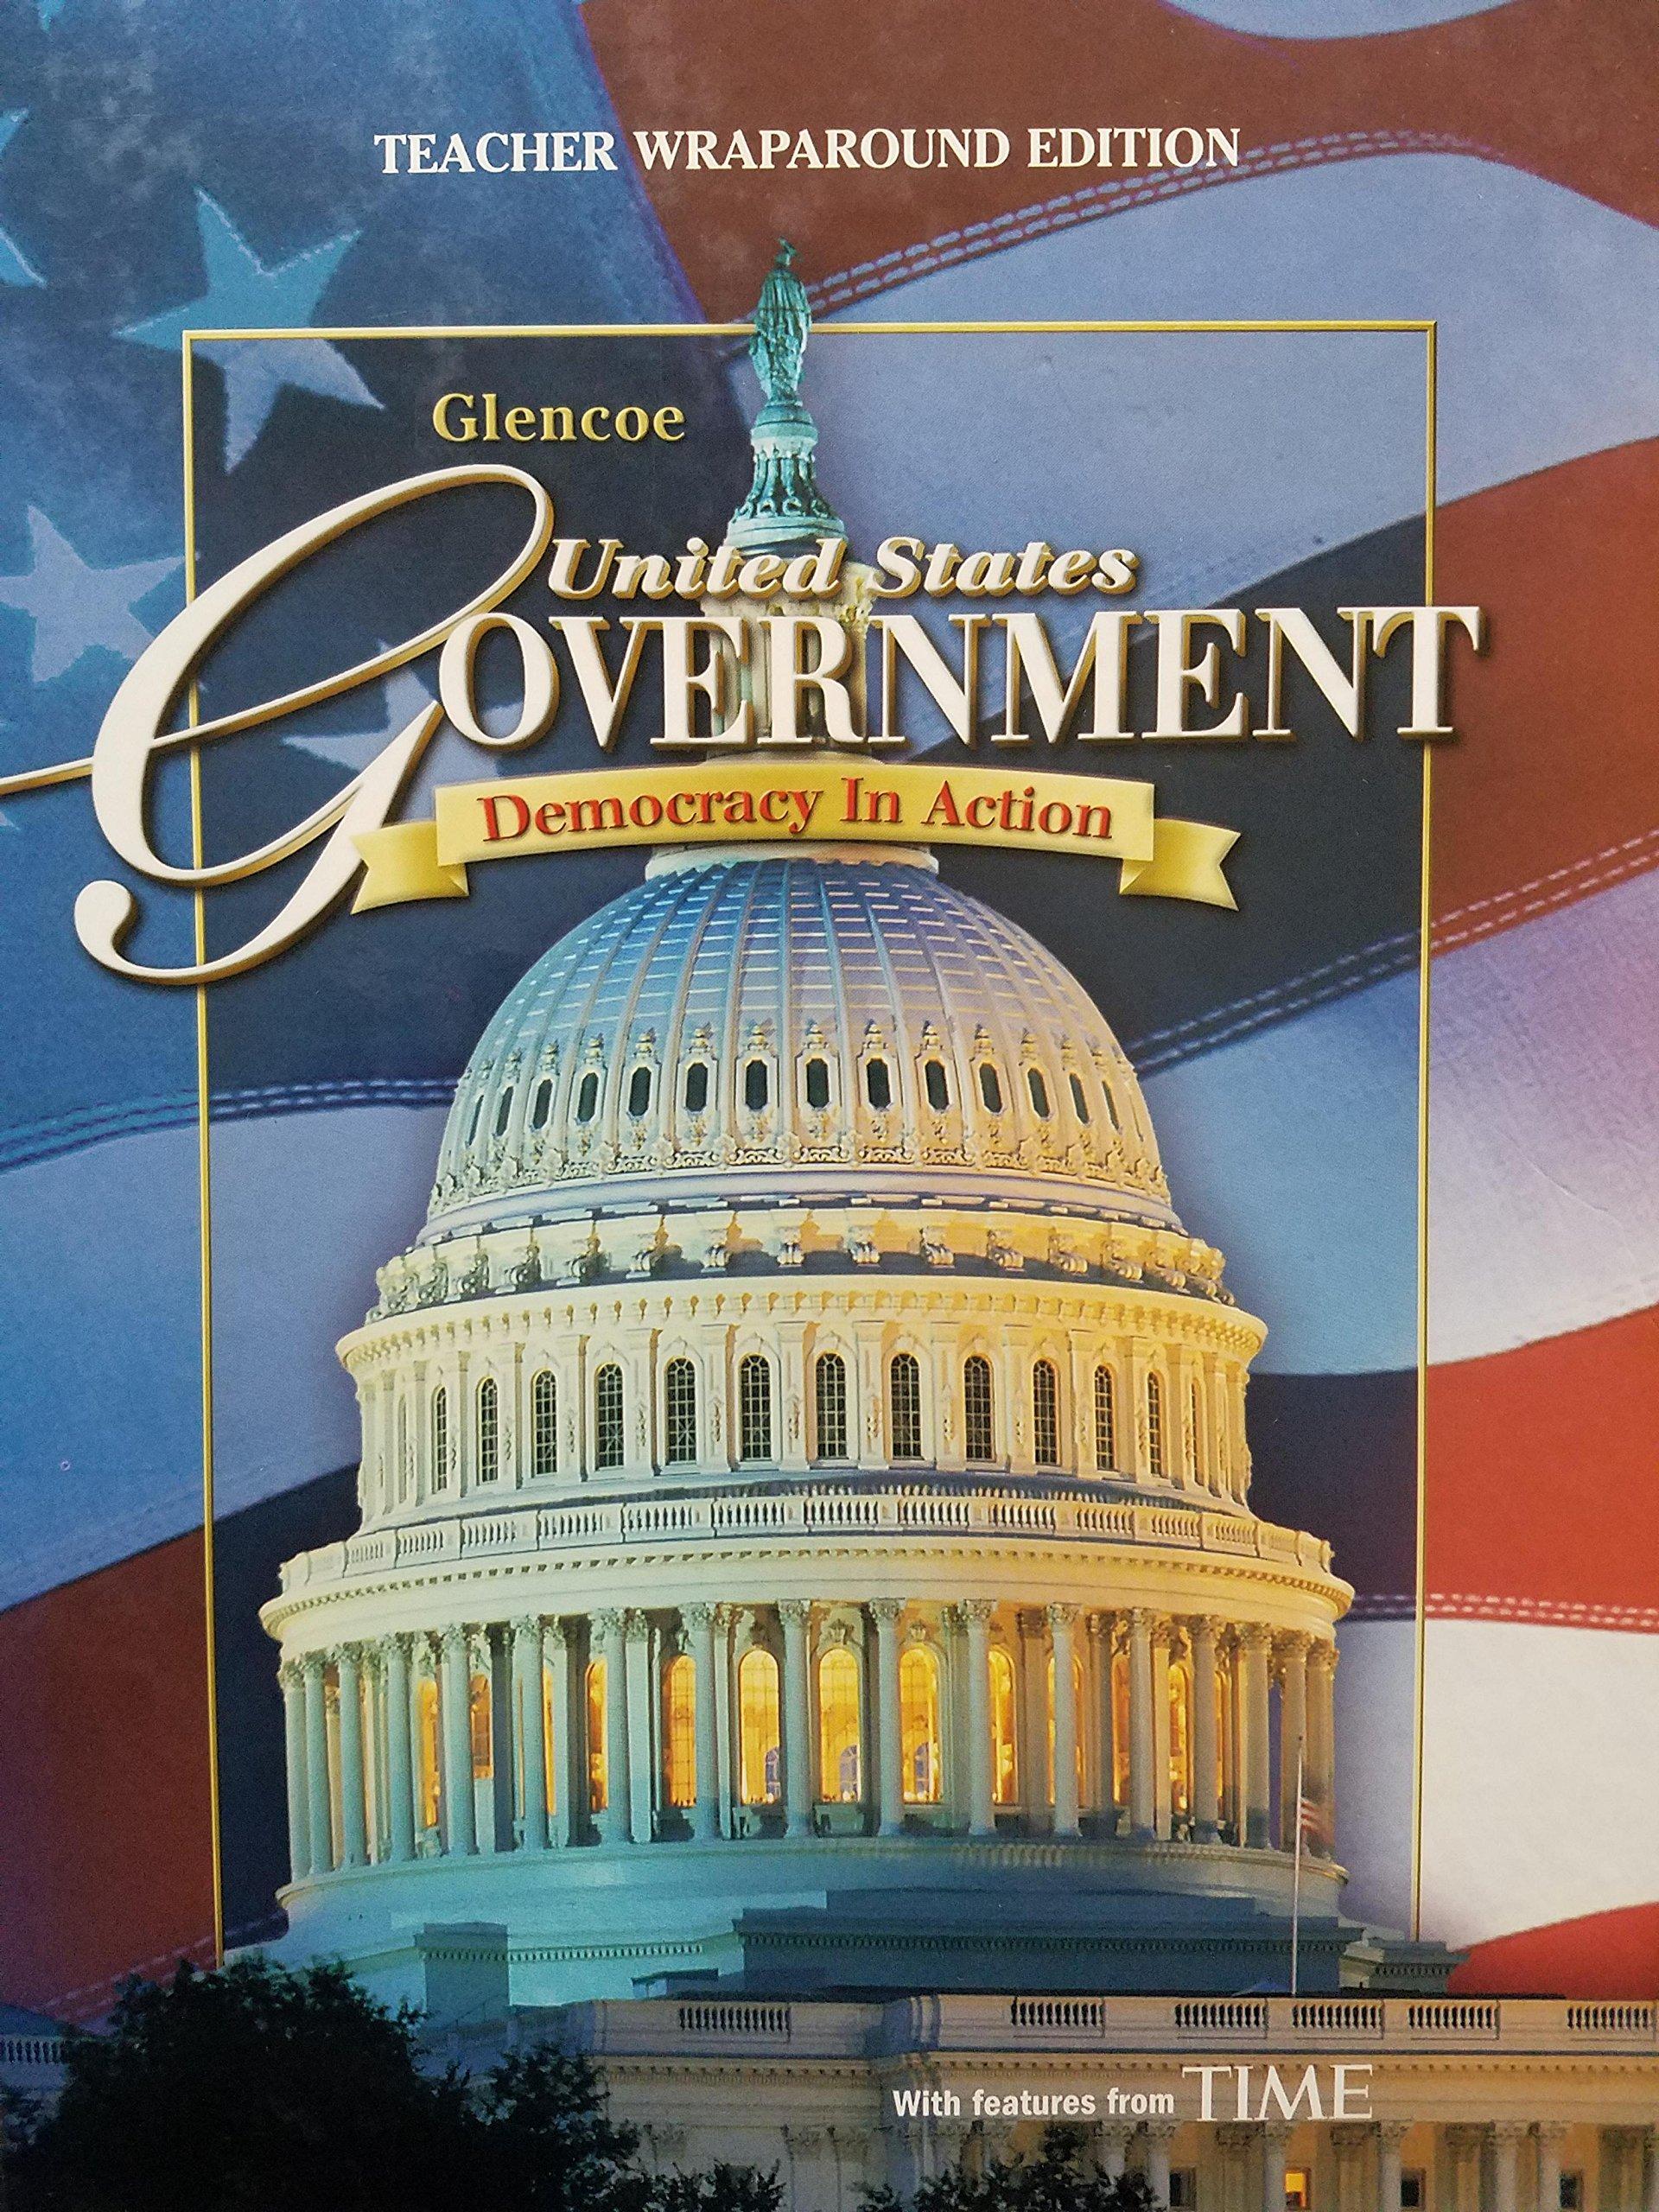 Glencoe United States Government; Democracy In Action. Teacher Wraparound  Edition, 9780078747632, 0078747635. c 2008: Amazon.com: Books